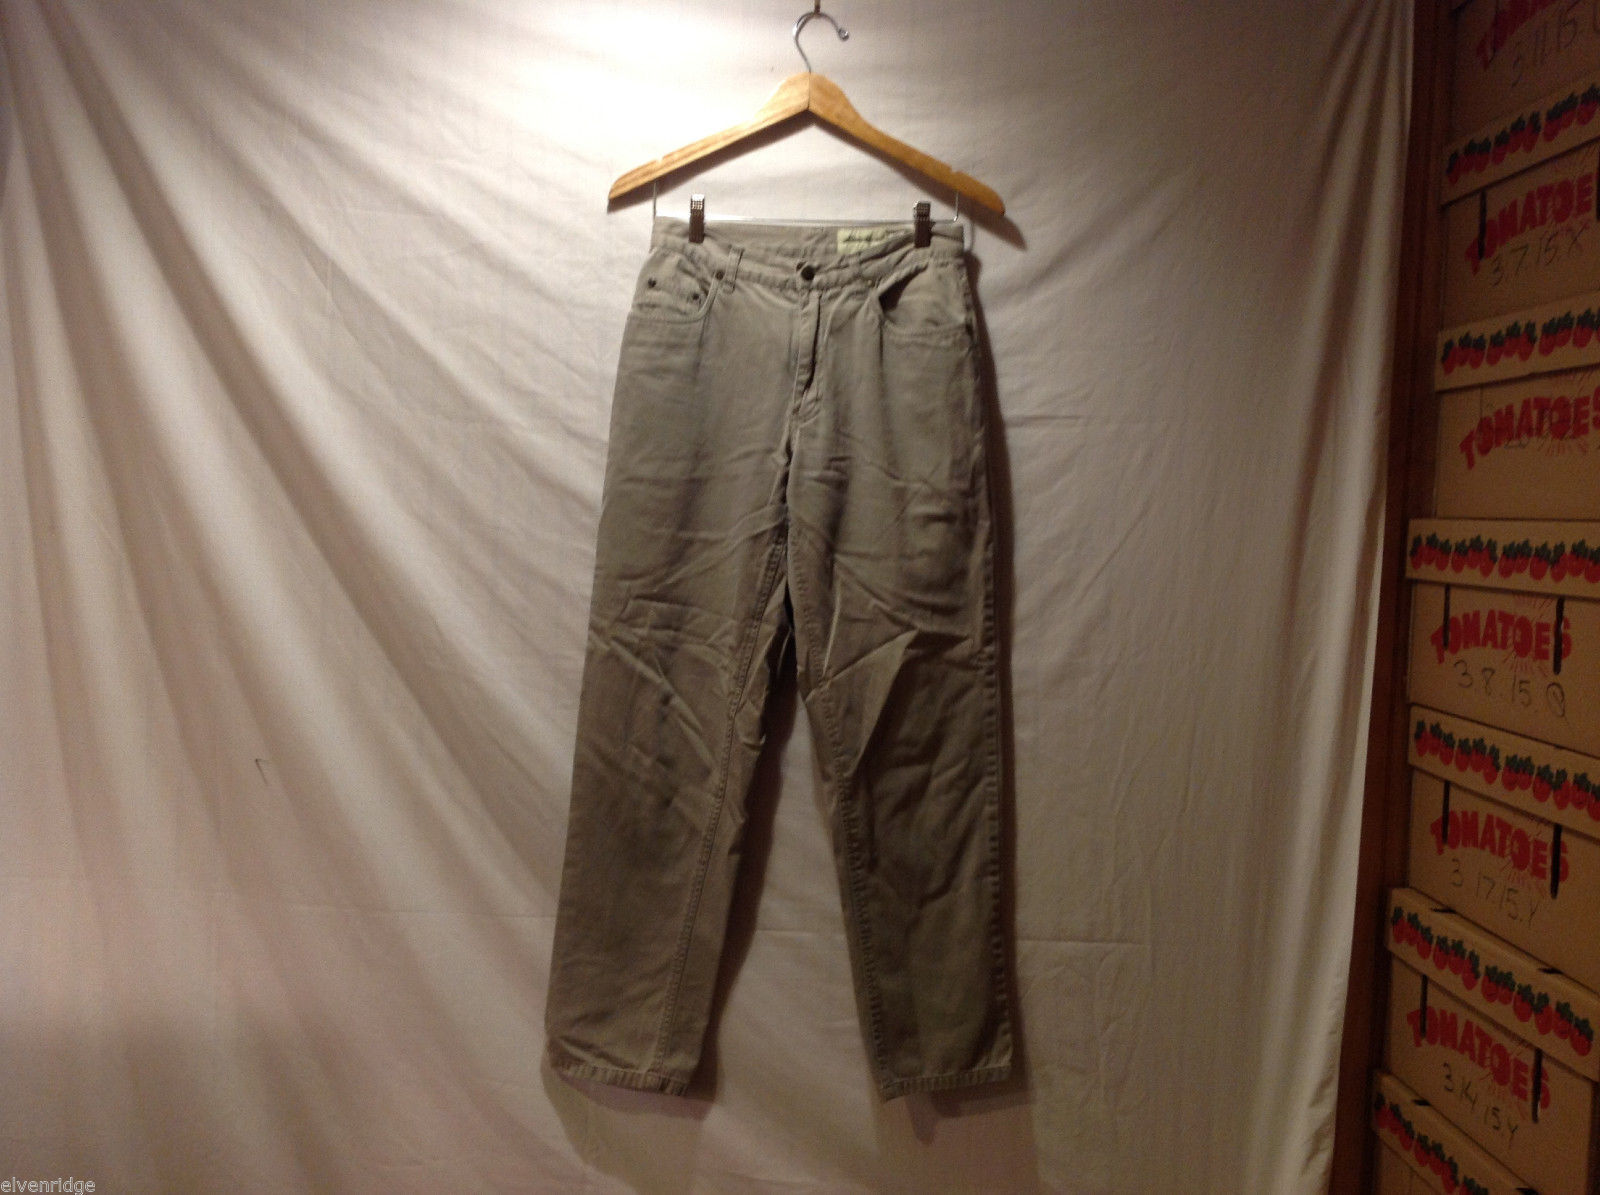 Eddie Bauer Womens 100% Cotton Beige Gray Jeans Pants, Size 6